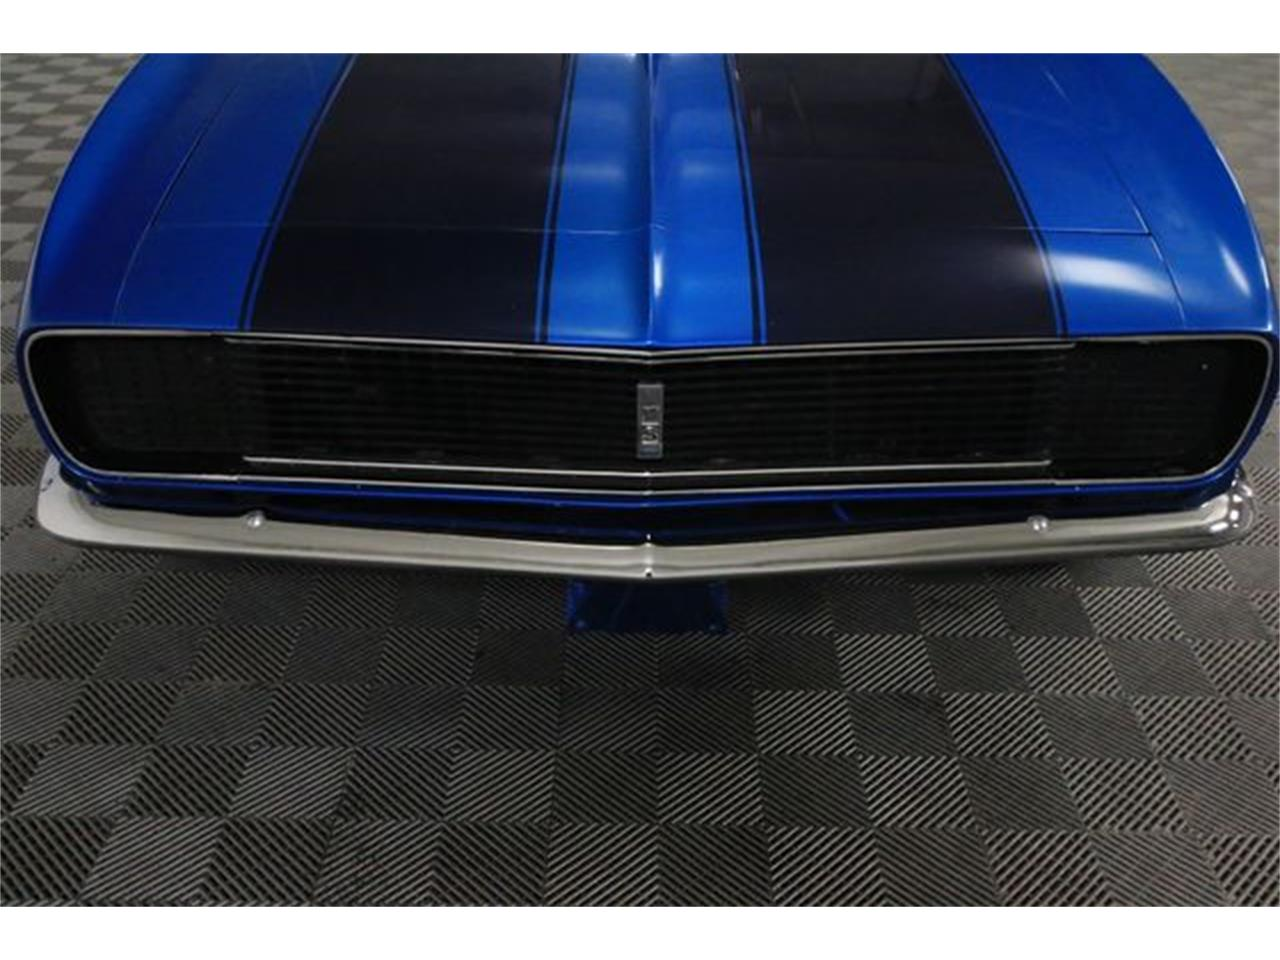 Large Picture of Classic 1967 Camaro located in Colorado - $28,900.00 - L3D7